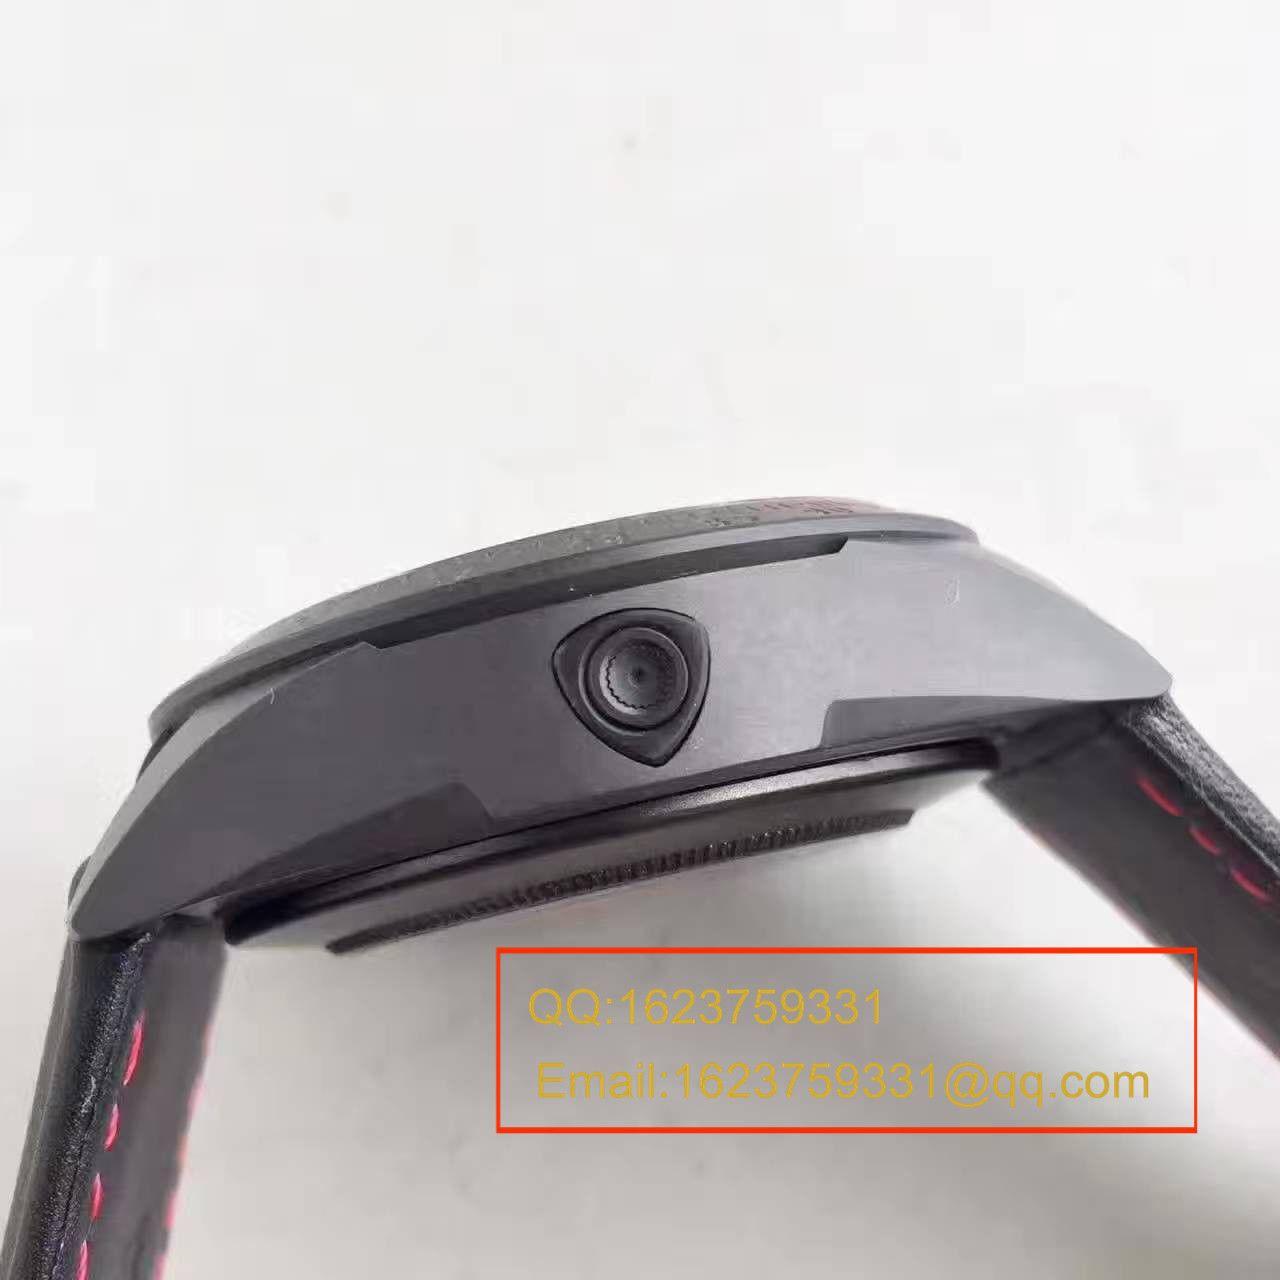 【ZF厂1:1复刻手表】帝舵《杜卡迪大魔鬼》FASTRIDER BLACK SHIELD系列42000CR橡胶表带腕表